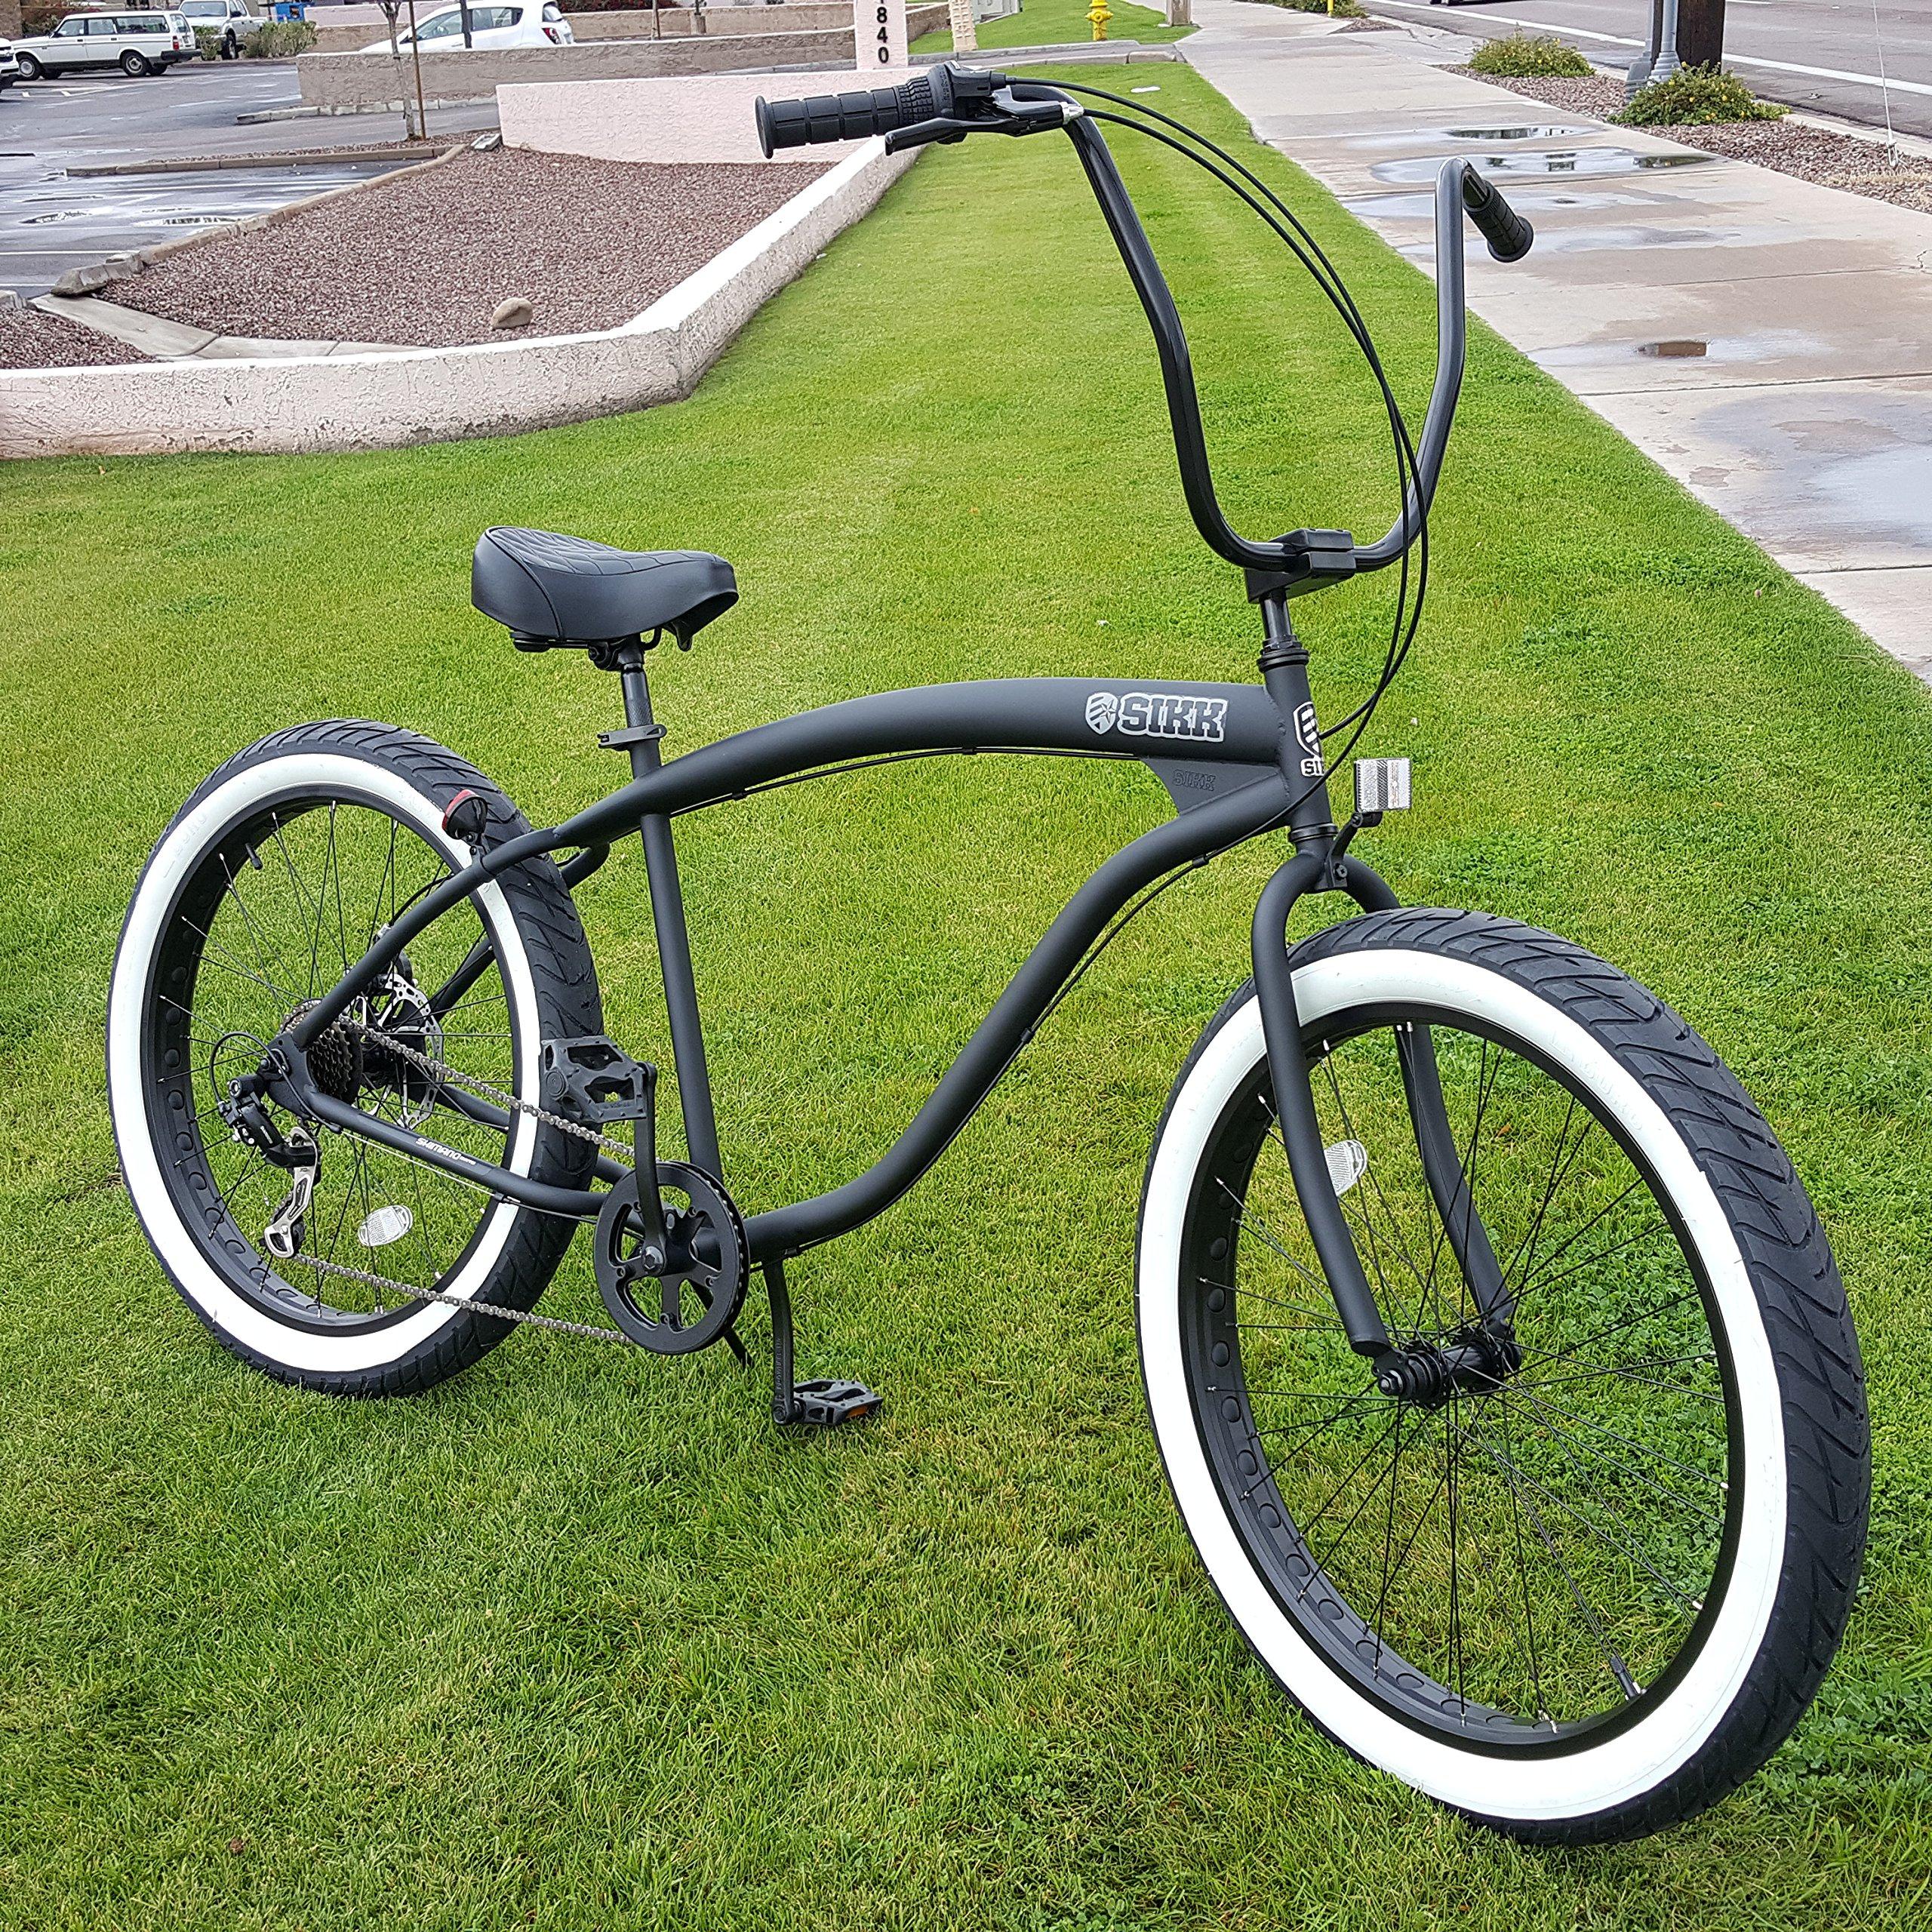 Sikk 3 0 Wide Ride Beach Cruiser Bicycle 7 Speed Flat Black